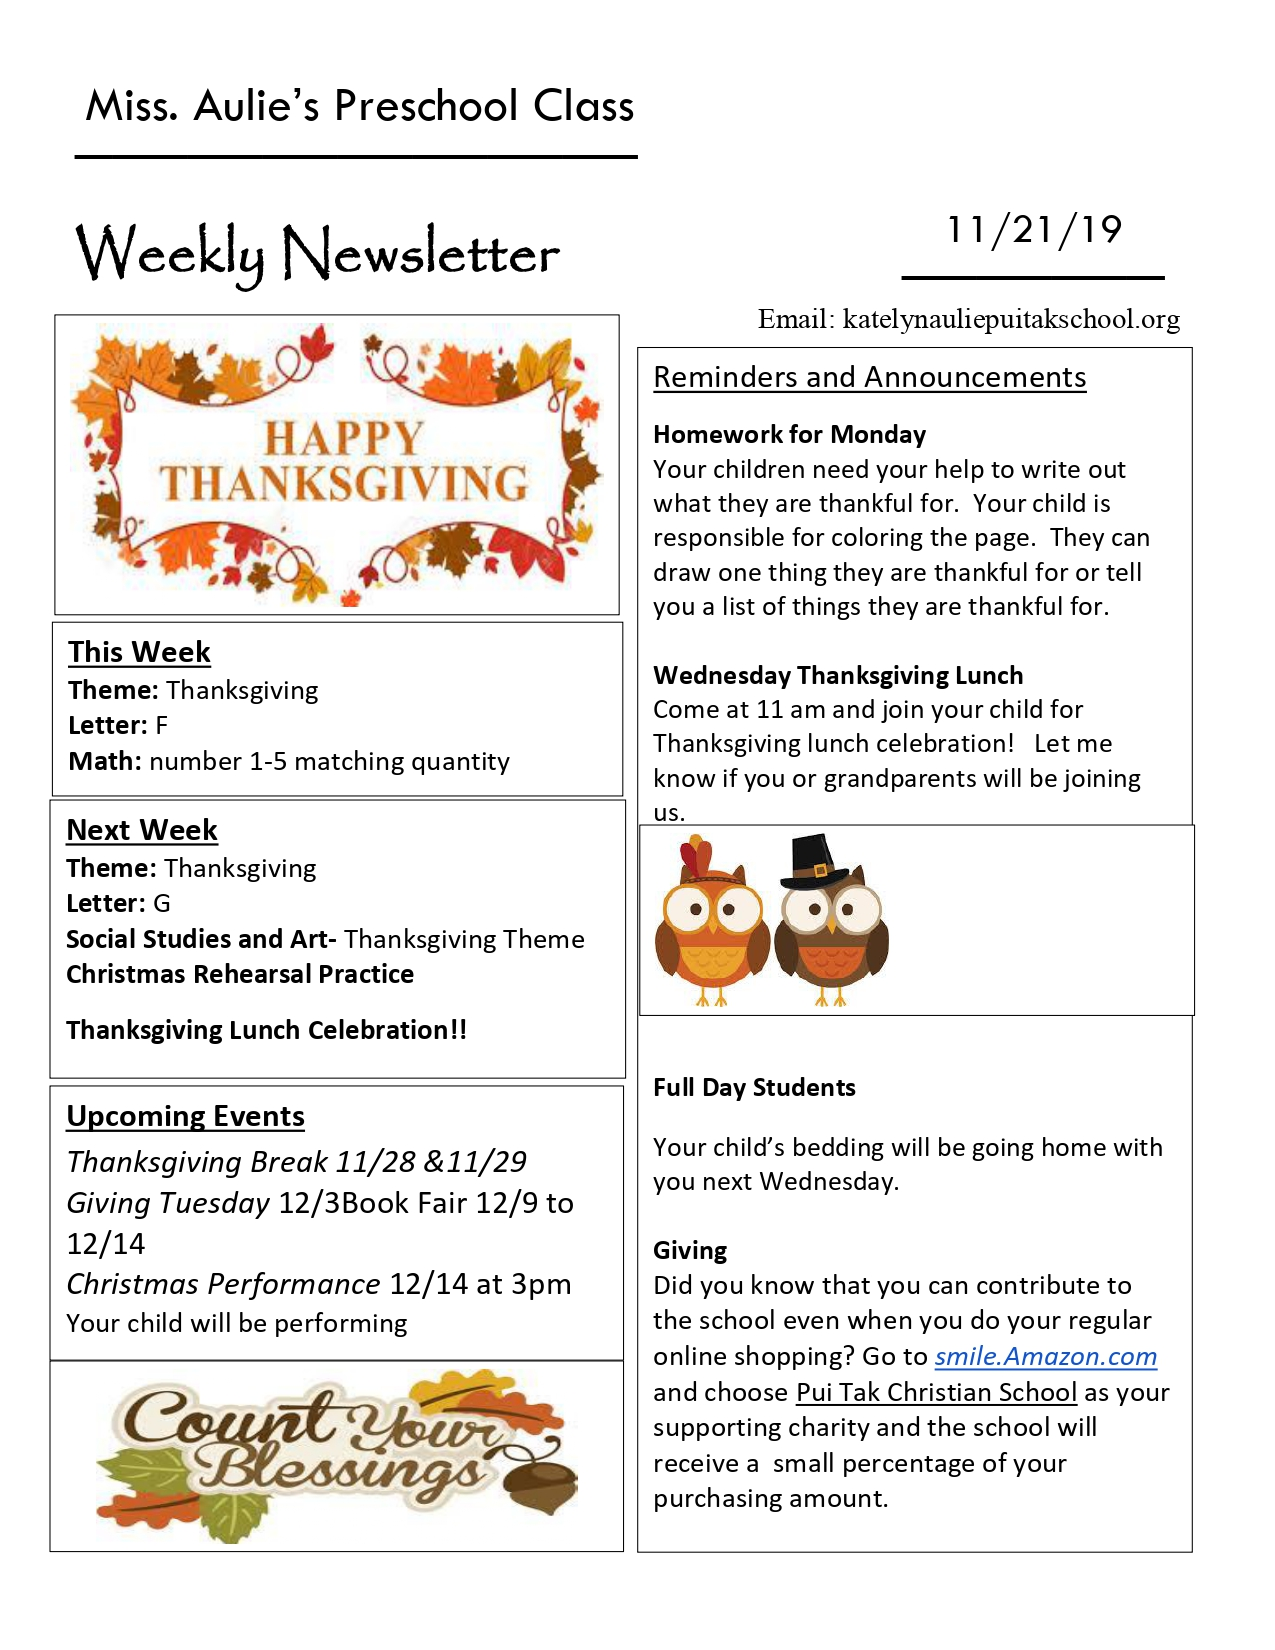 KatelynNewsletter2019November3rdWeek_pag